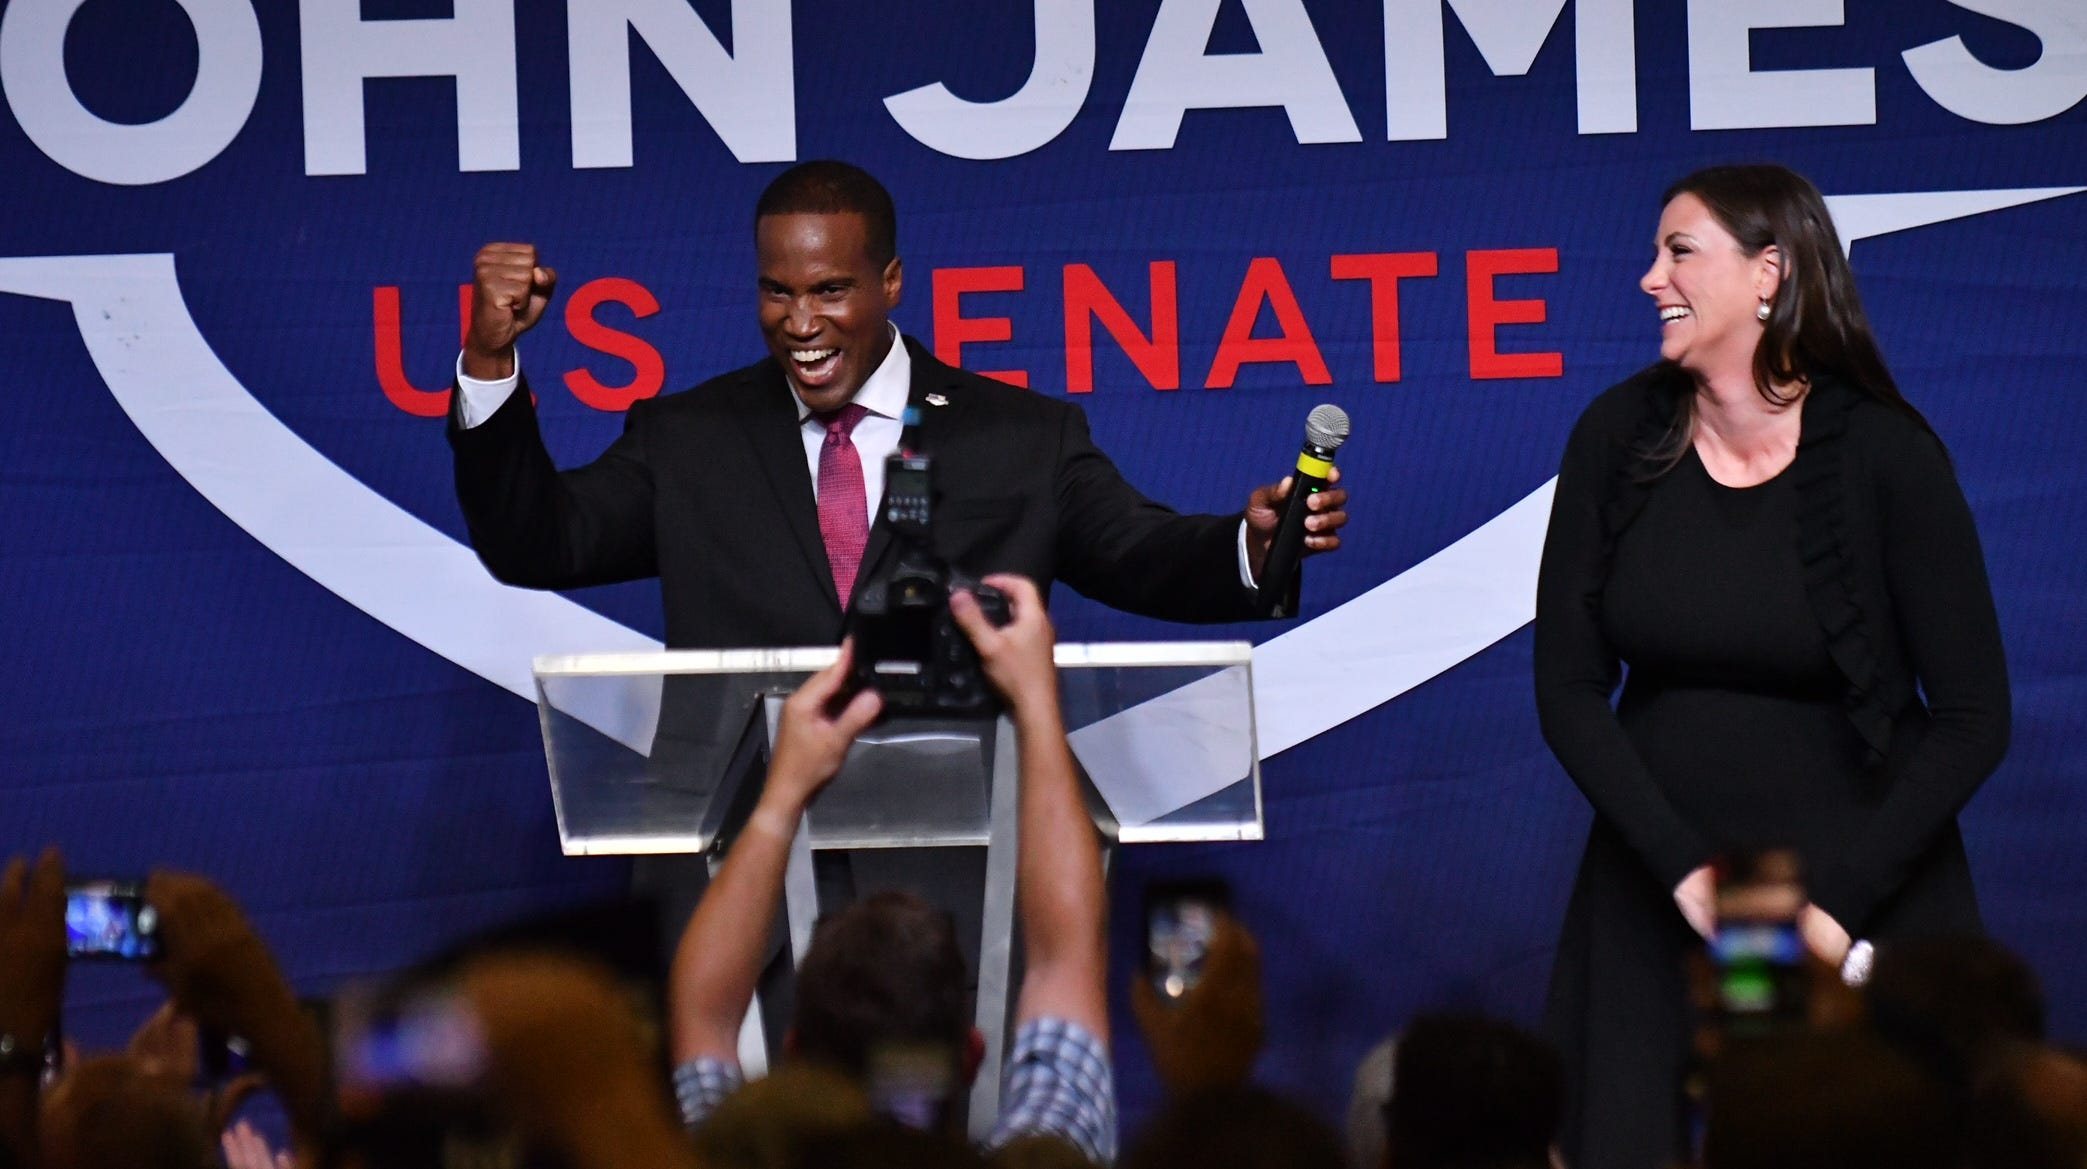 James wins Republican U.S. Senate primary to take on U.S. Sen. Stabenow